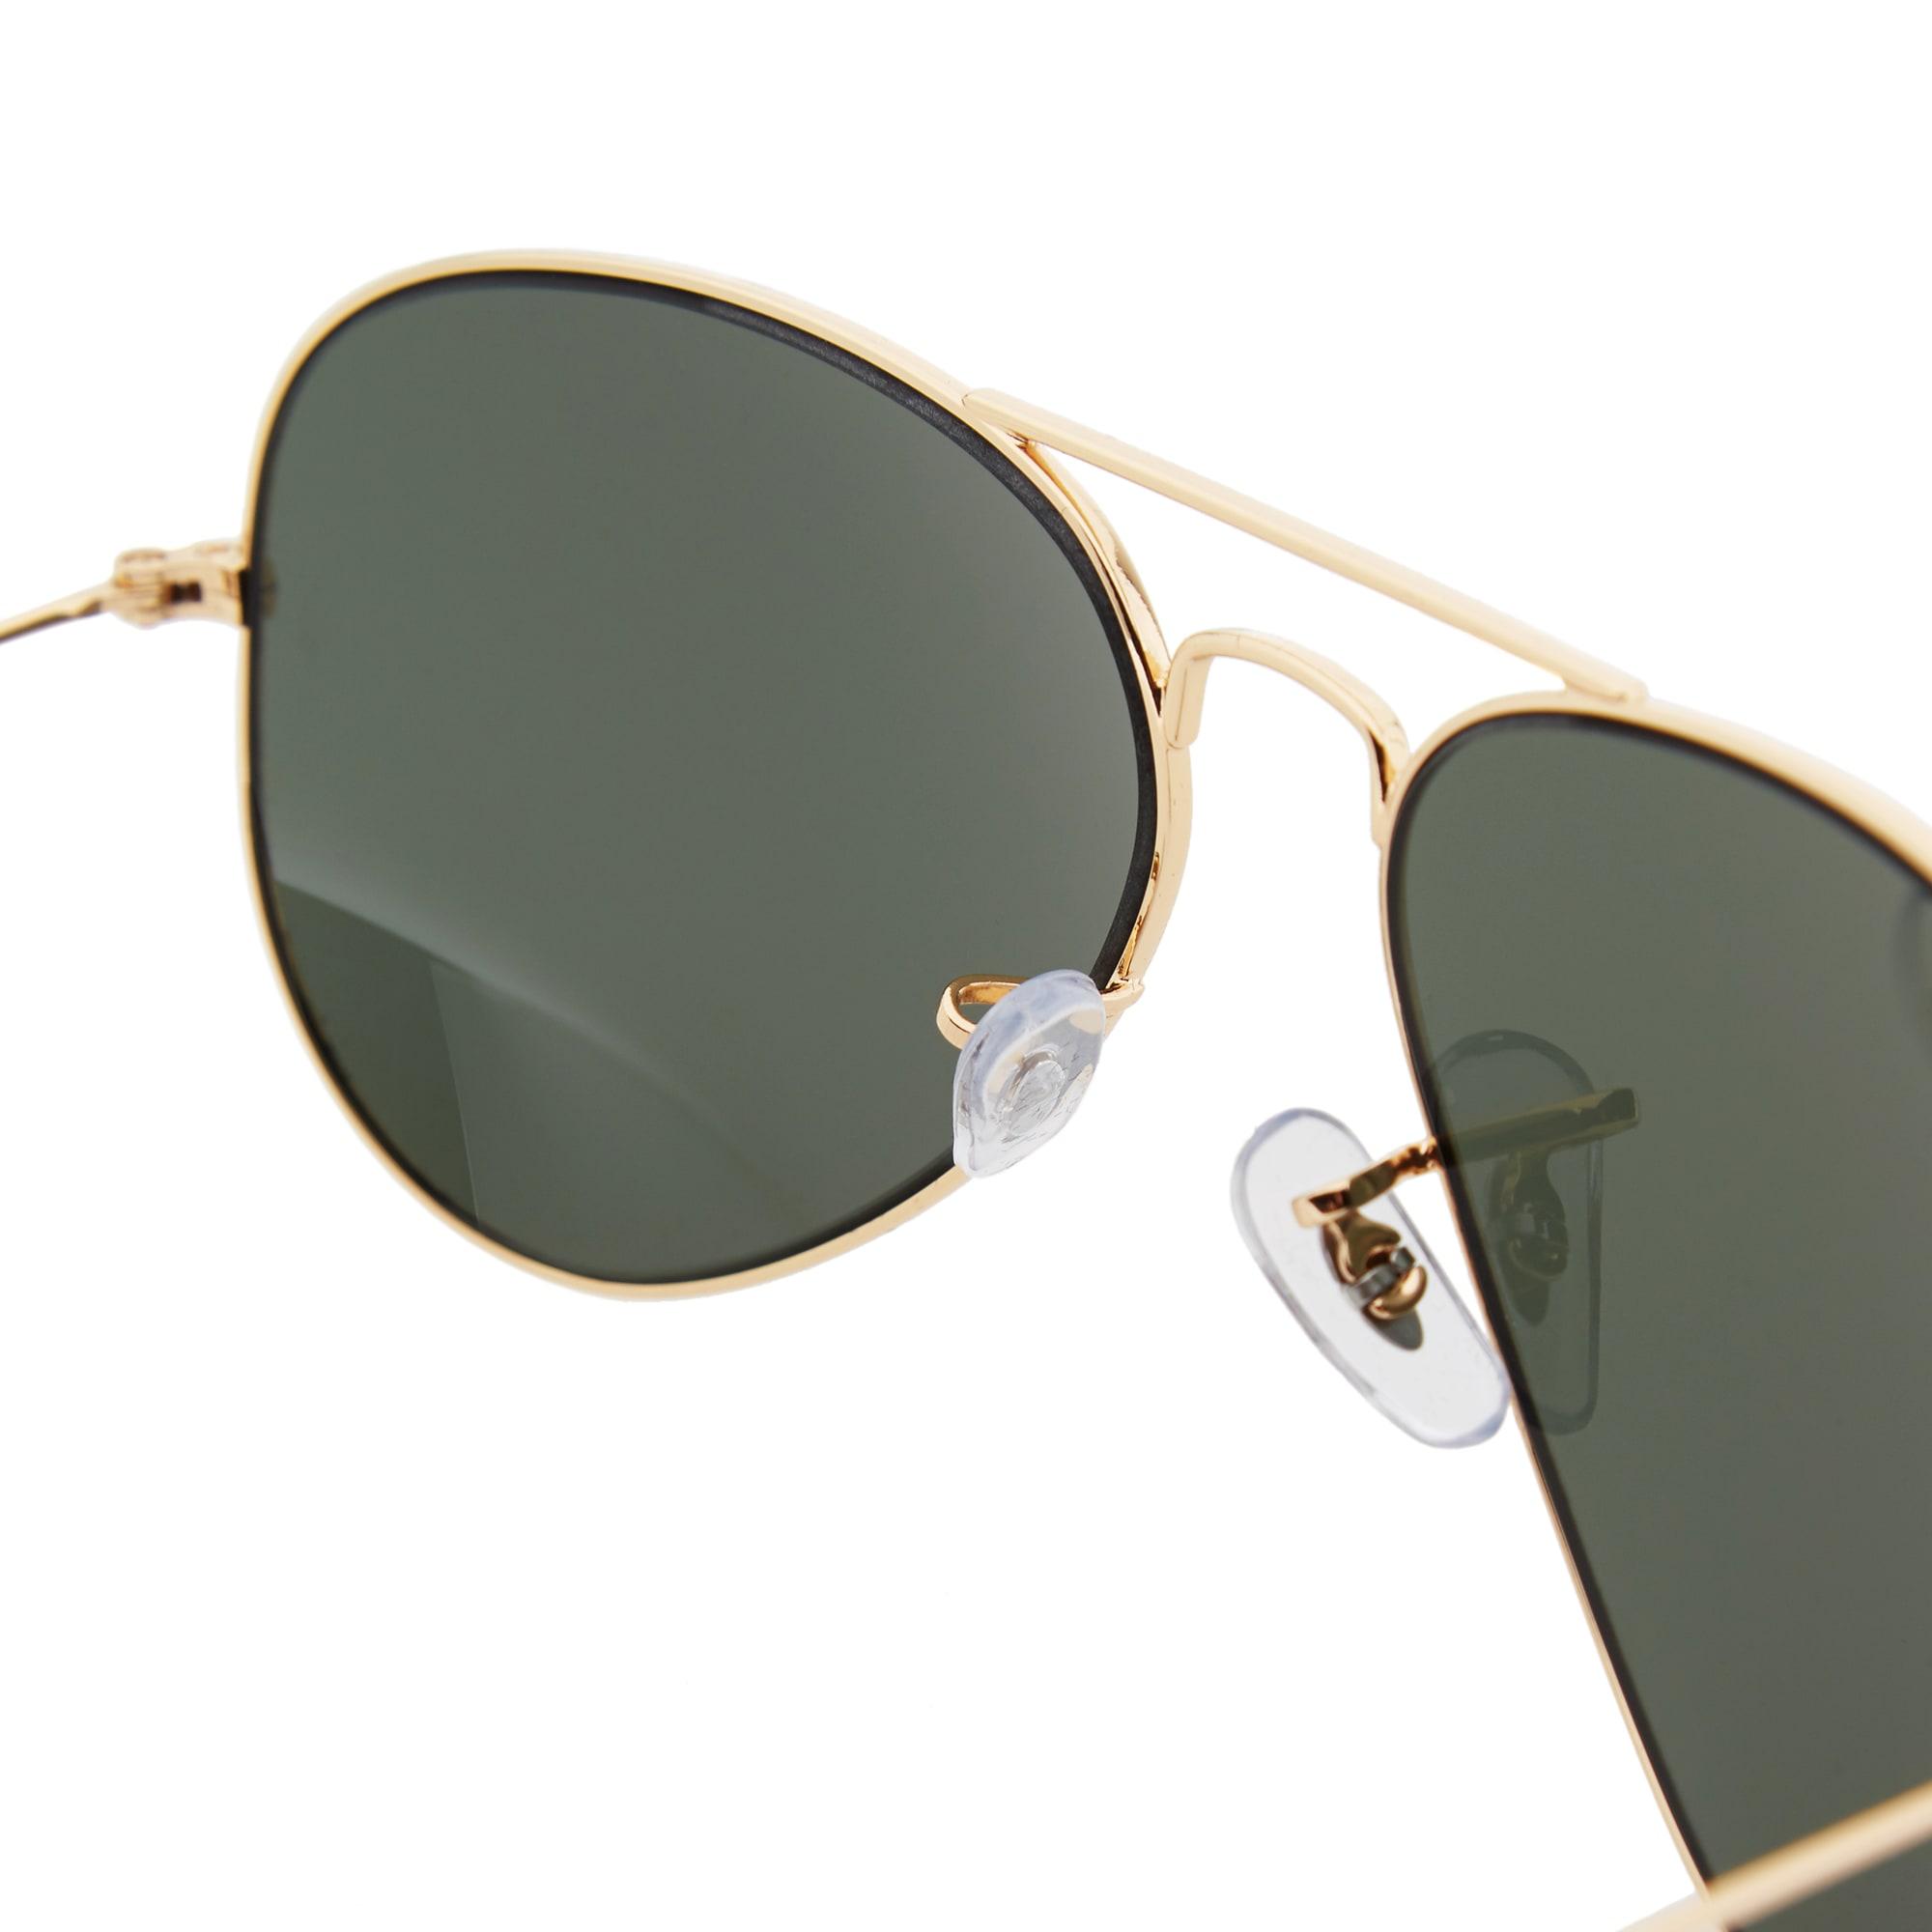 0355056ae21a Ray Ban Sunglasses Belgium